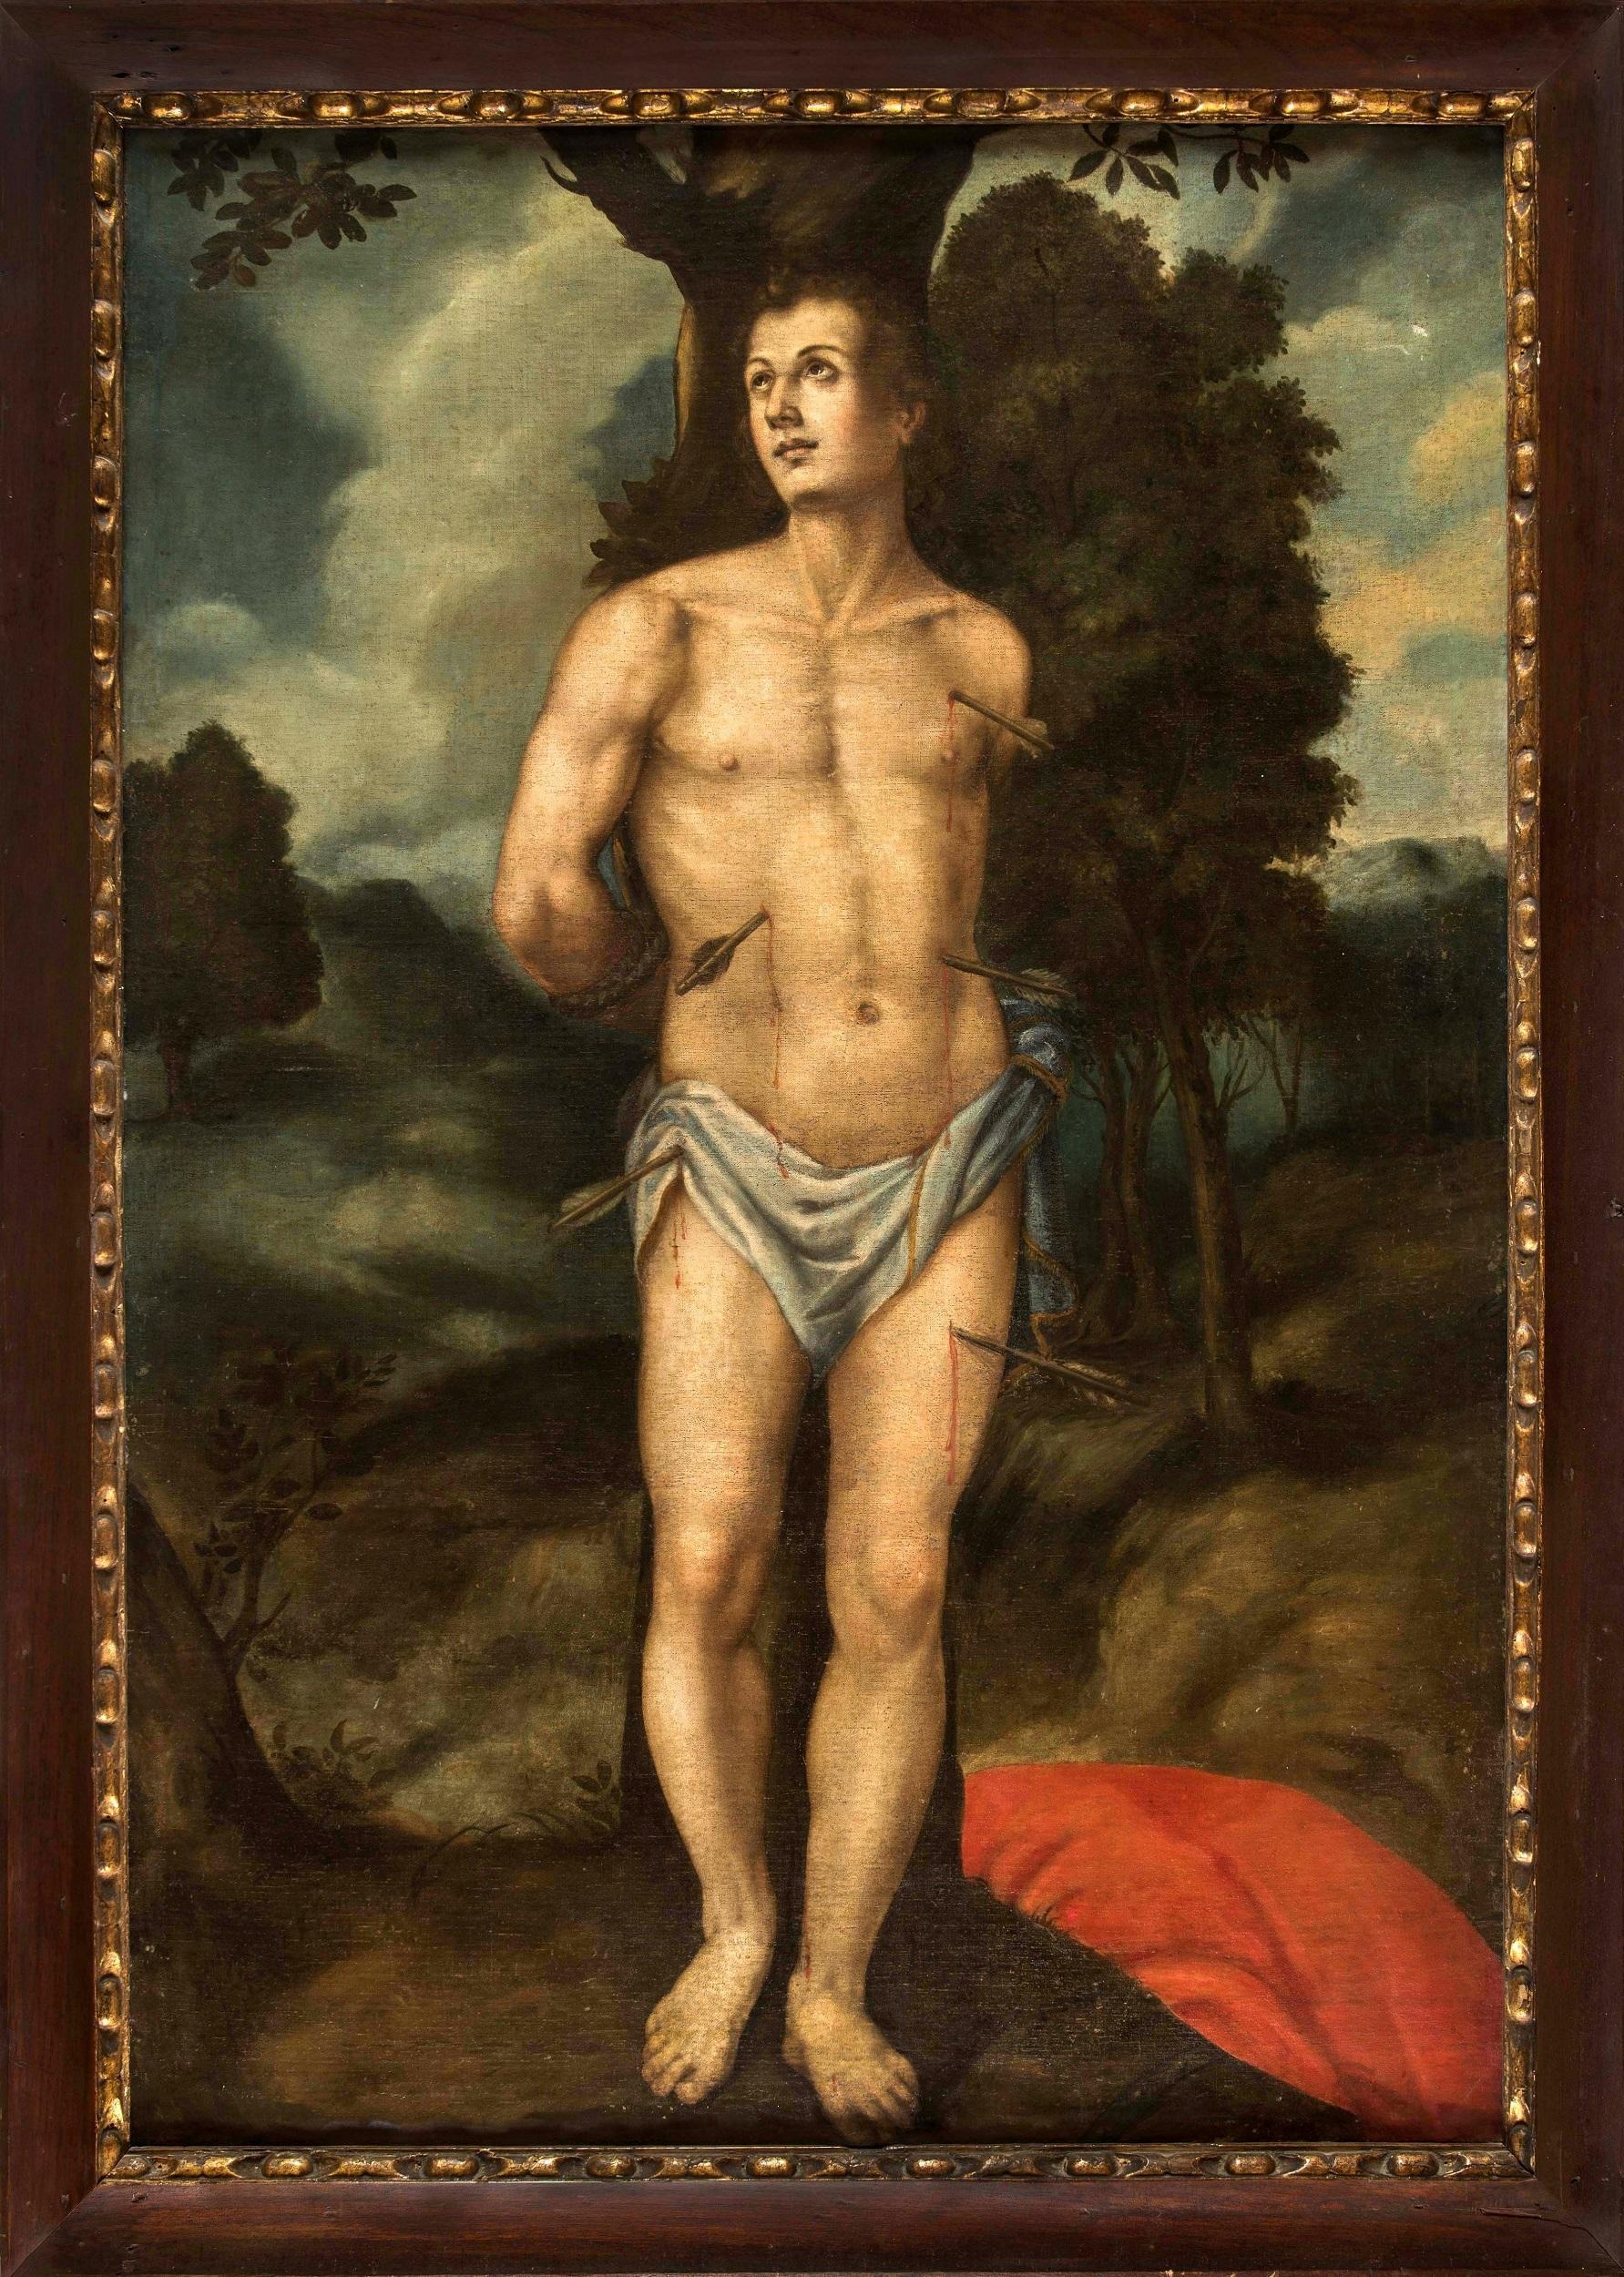 Saint Sebastian Antique Spanish School Oil on Canvas Religious Portait Painting